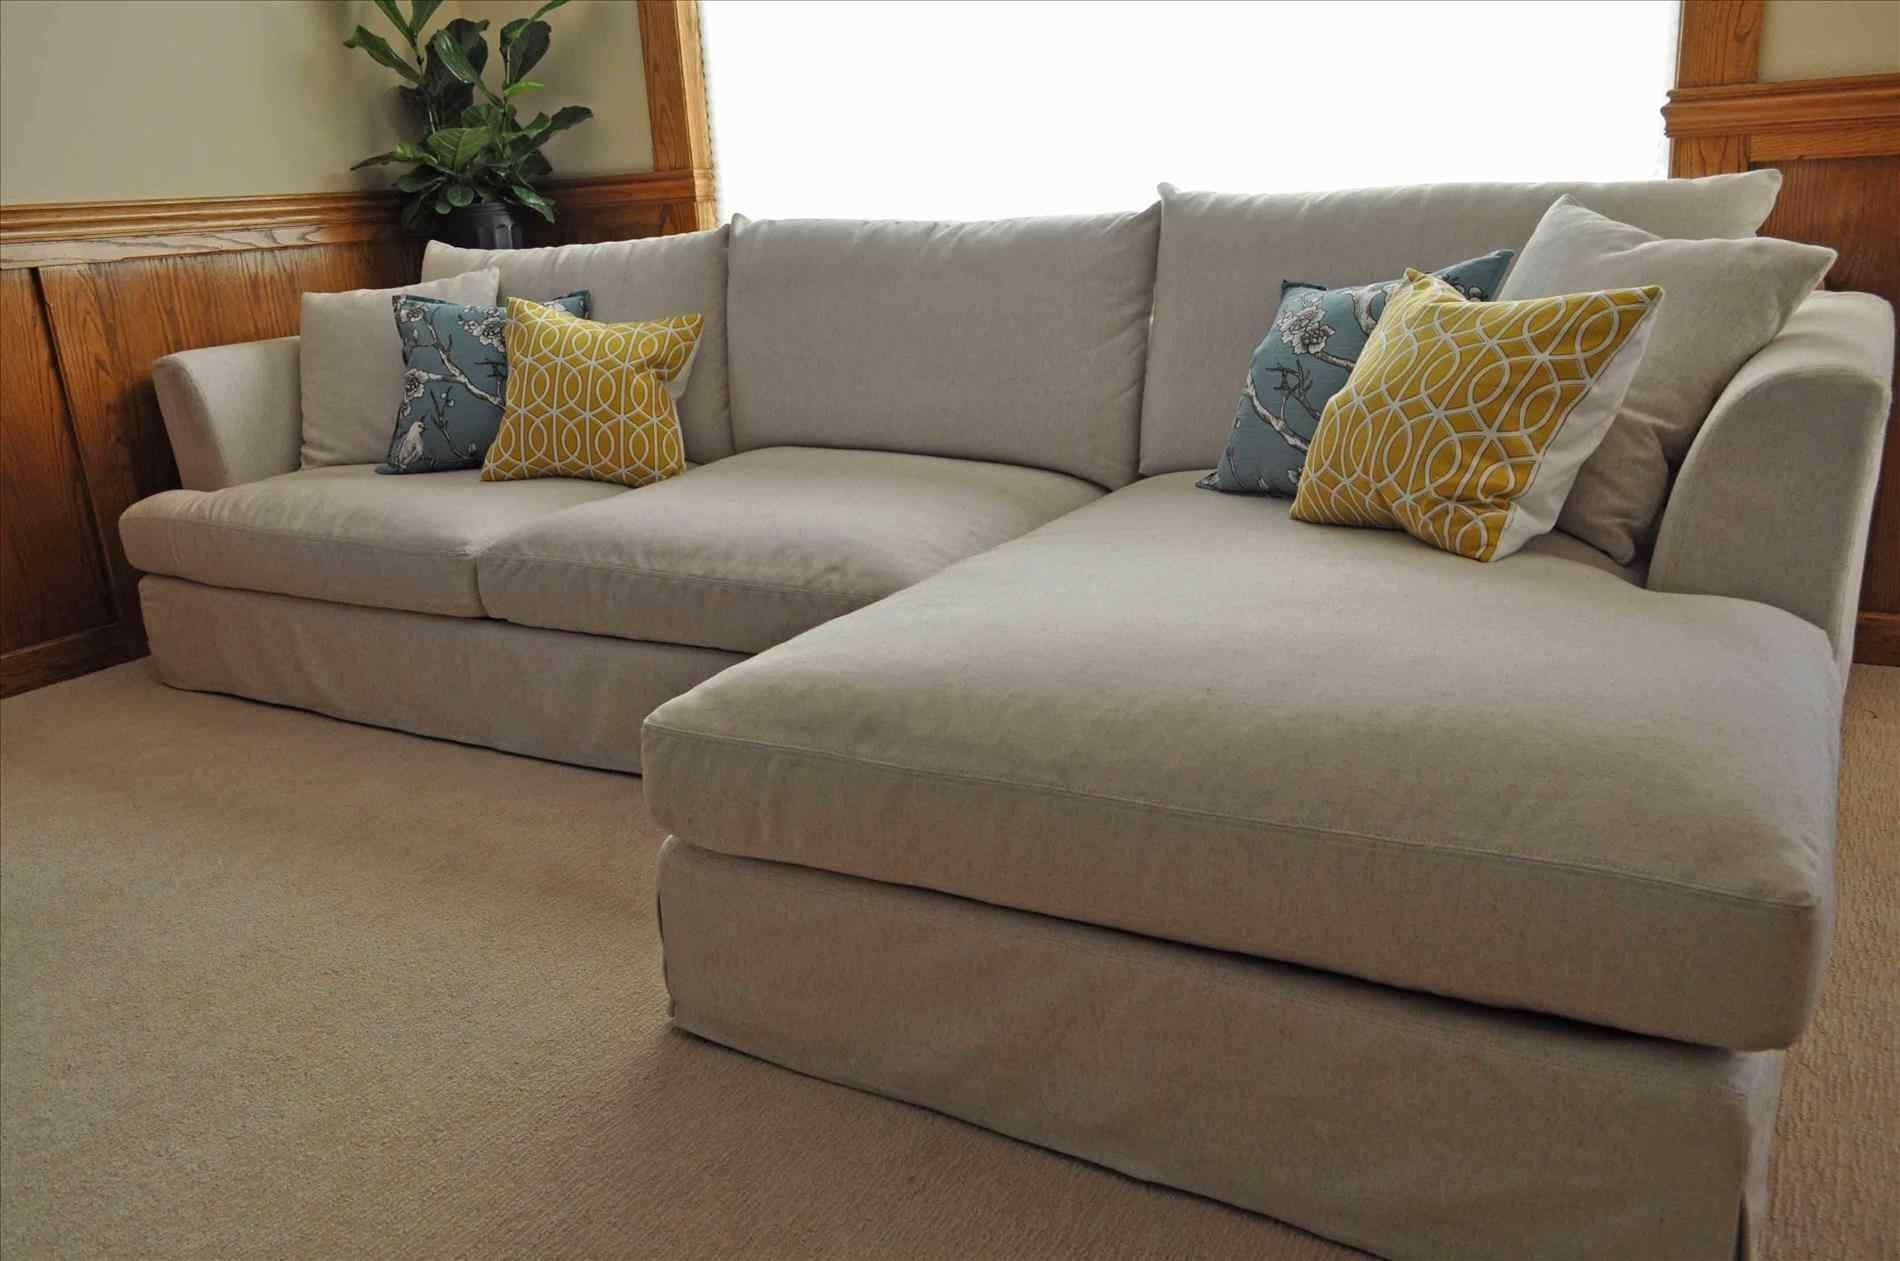 Rhfcdhwinfo Sofa Best Slipcovered Cheap Gray Set Rhbirtondemandcom